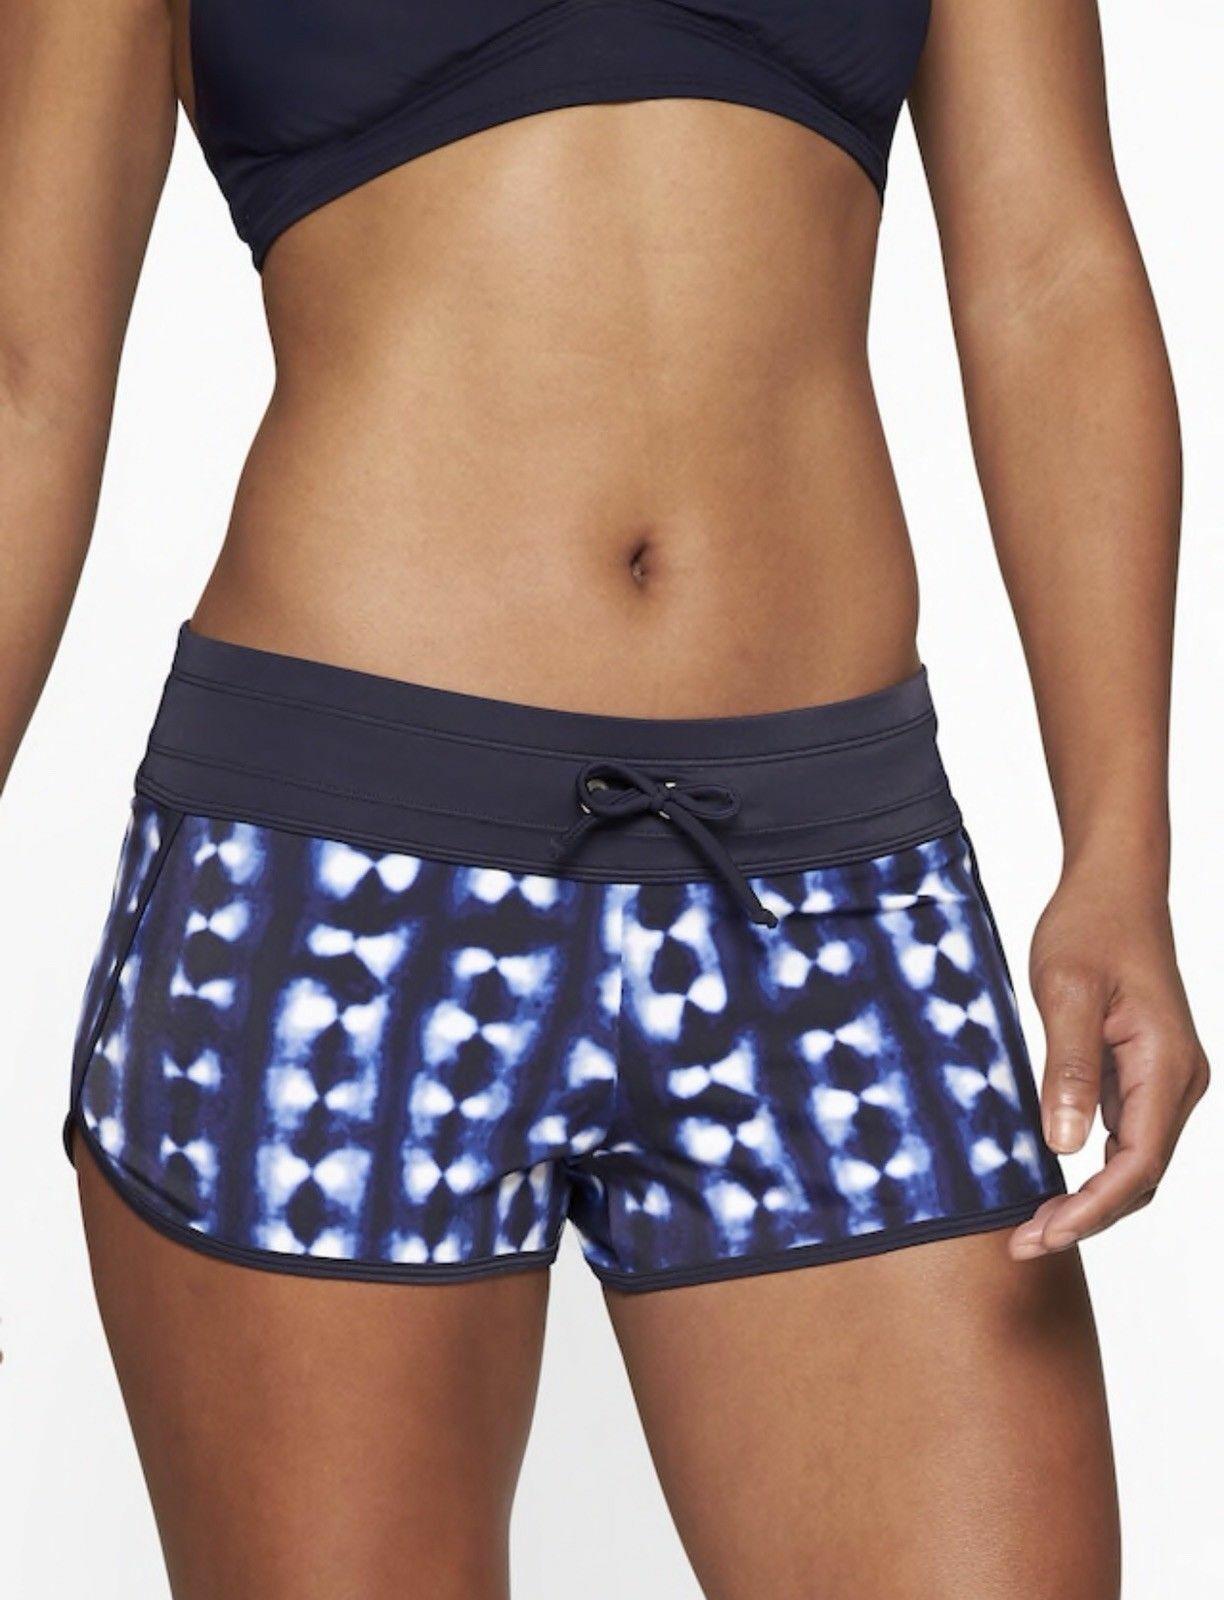 Athleta Mashiko Kata Short, Dress bluee, Size  XL, Beach, Surf, Swim  54, NWT